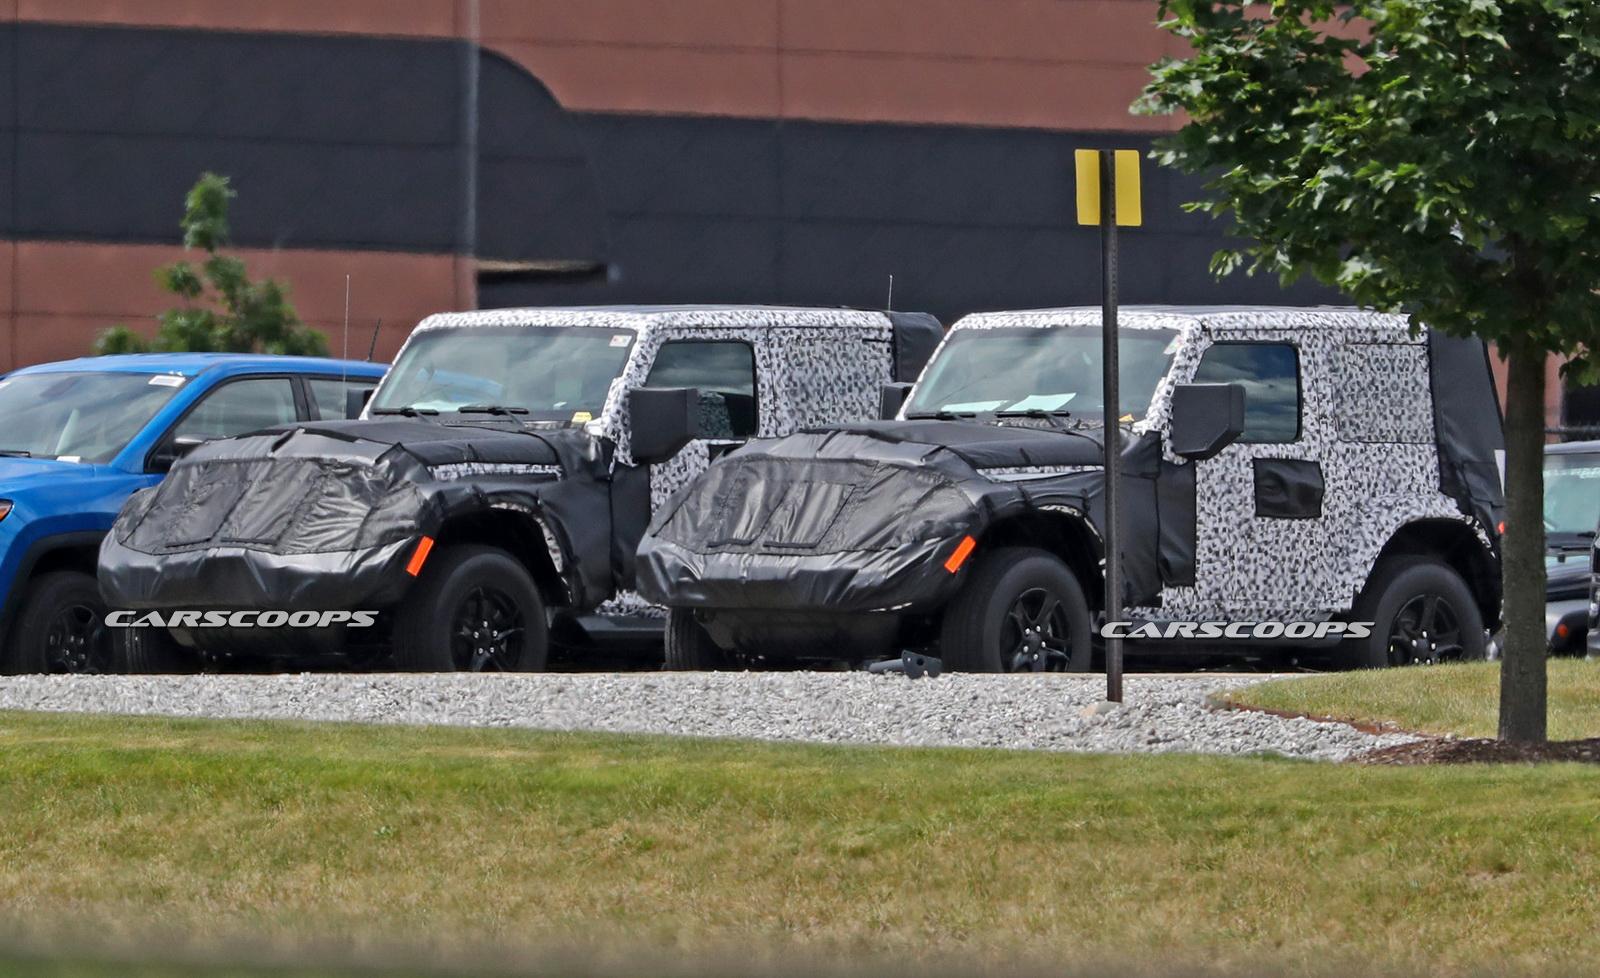 2018 Jeep Wrangler Owners Manual Leaks Online Car News Leak Jk Photo Gallery